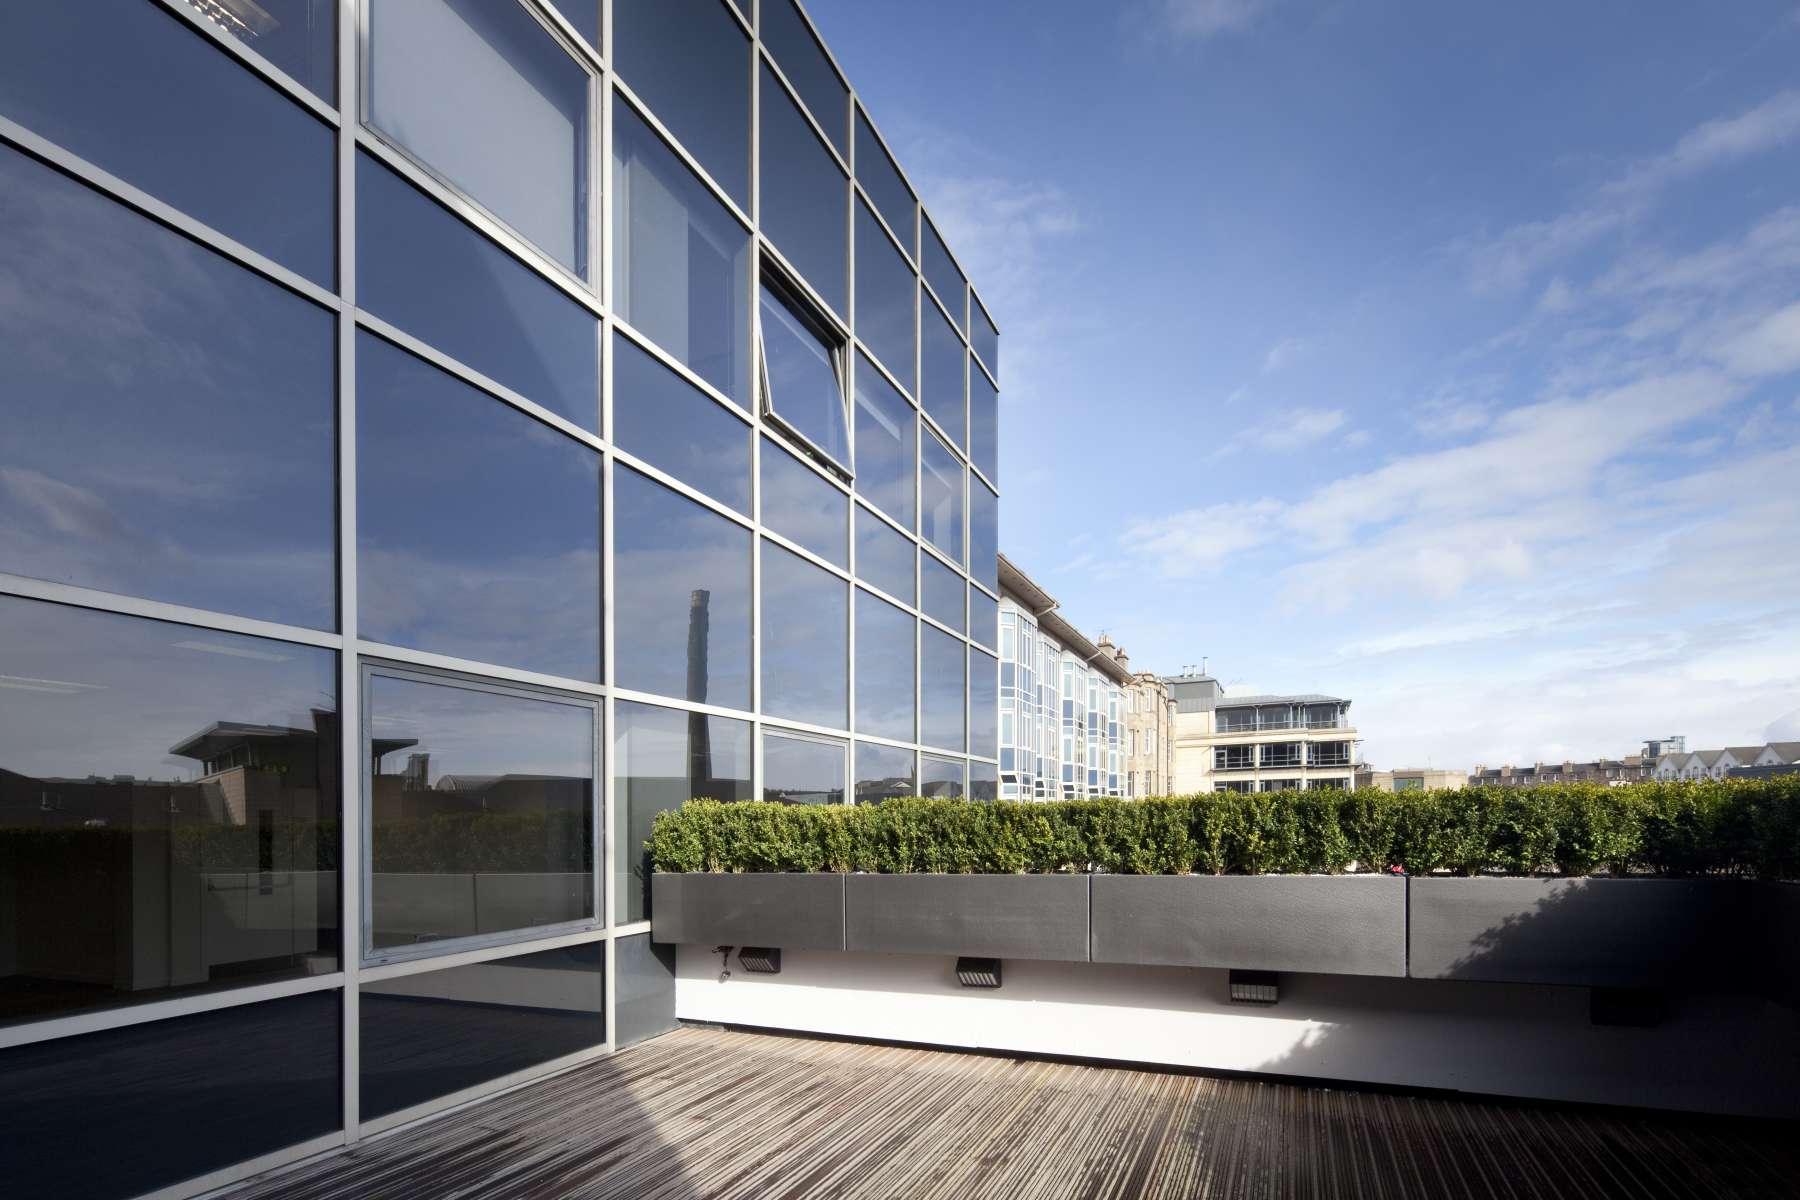 Office Property To Rent Apex 123 EH12 5HD Edinburgh 1003